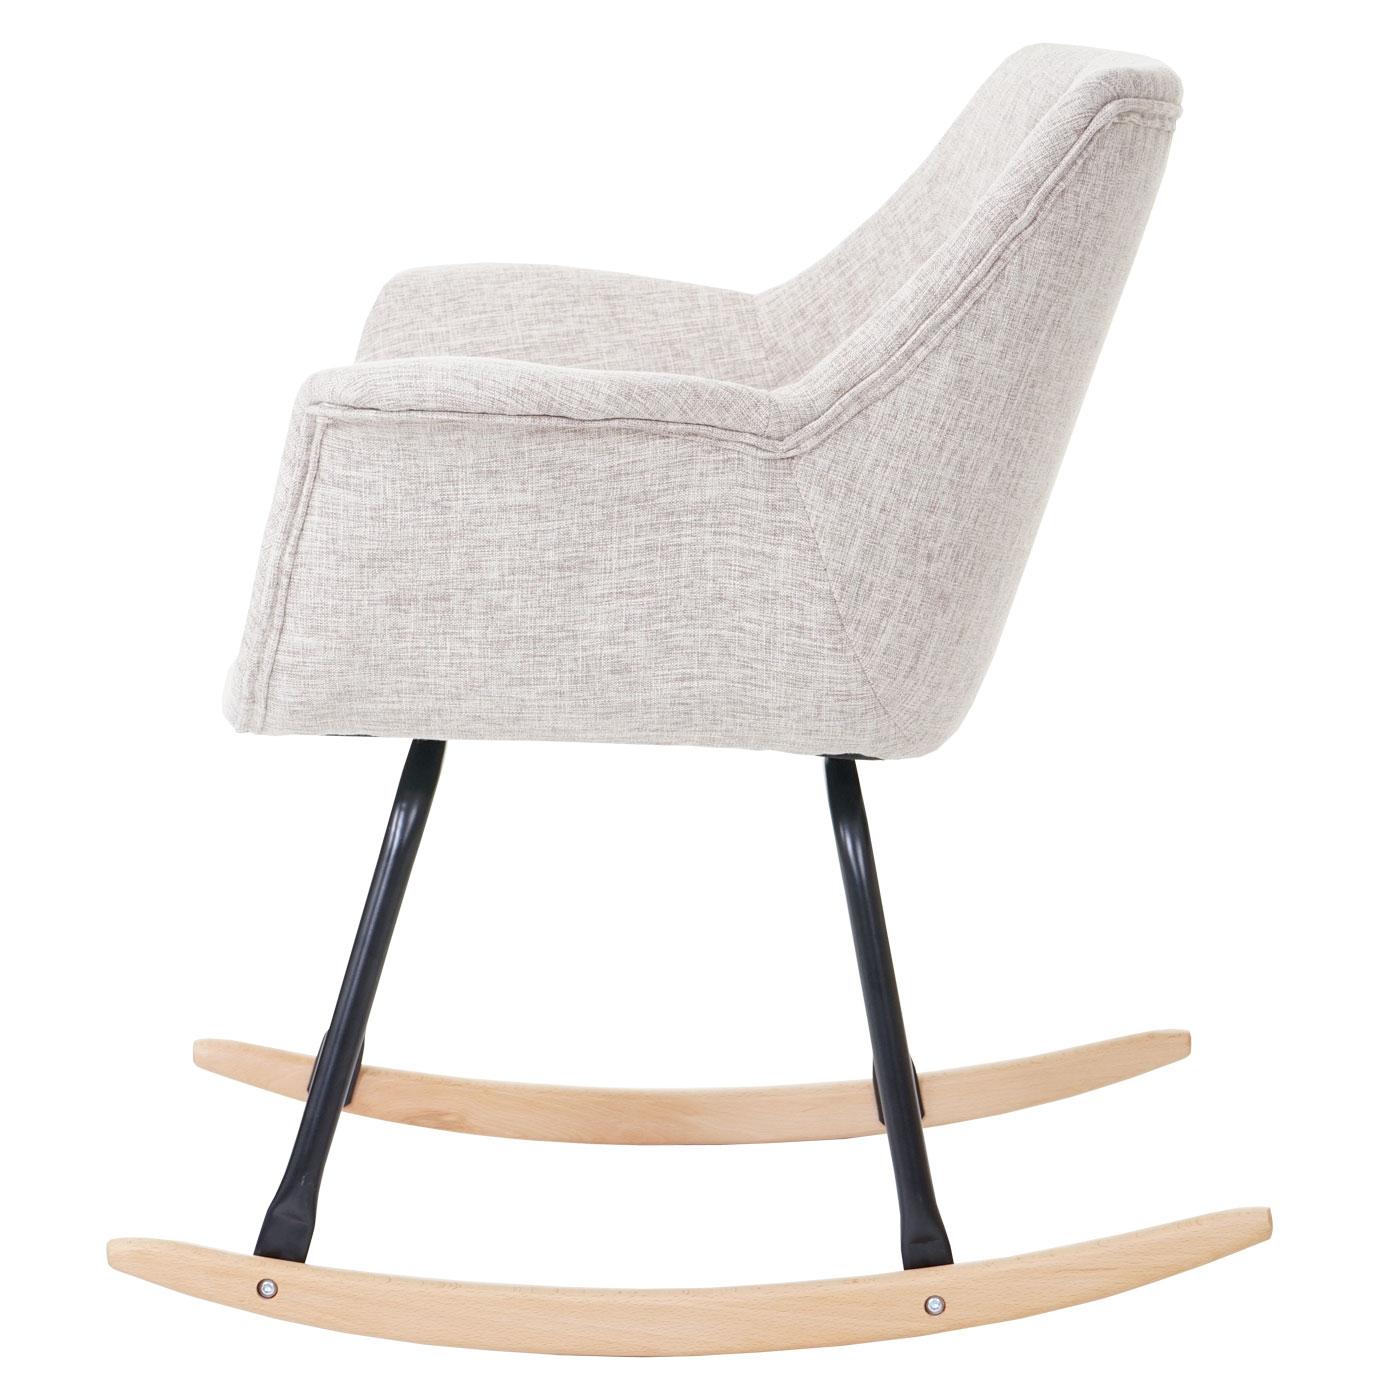 schaukelstuhl malm t820 schwingsessel relaxsessel ebay. Black Bedroom Furniture Sets. Home Design Ideas